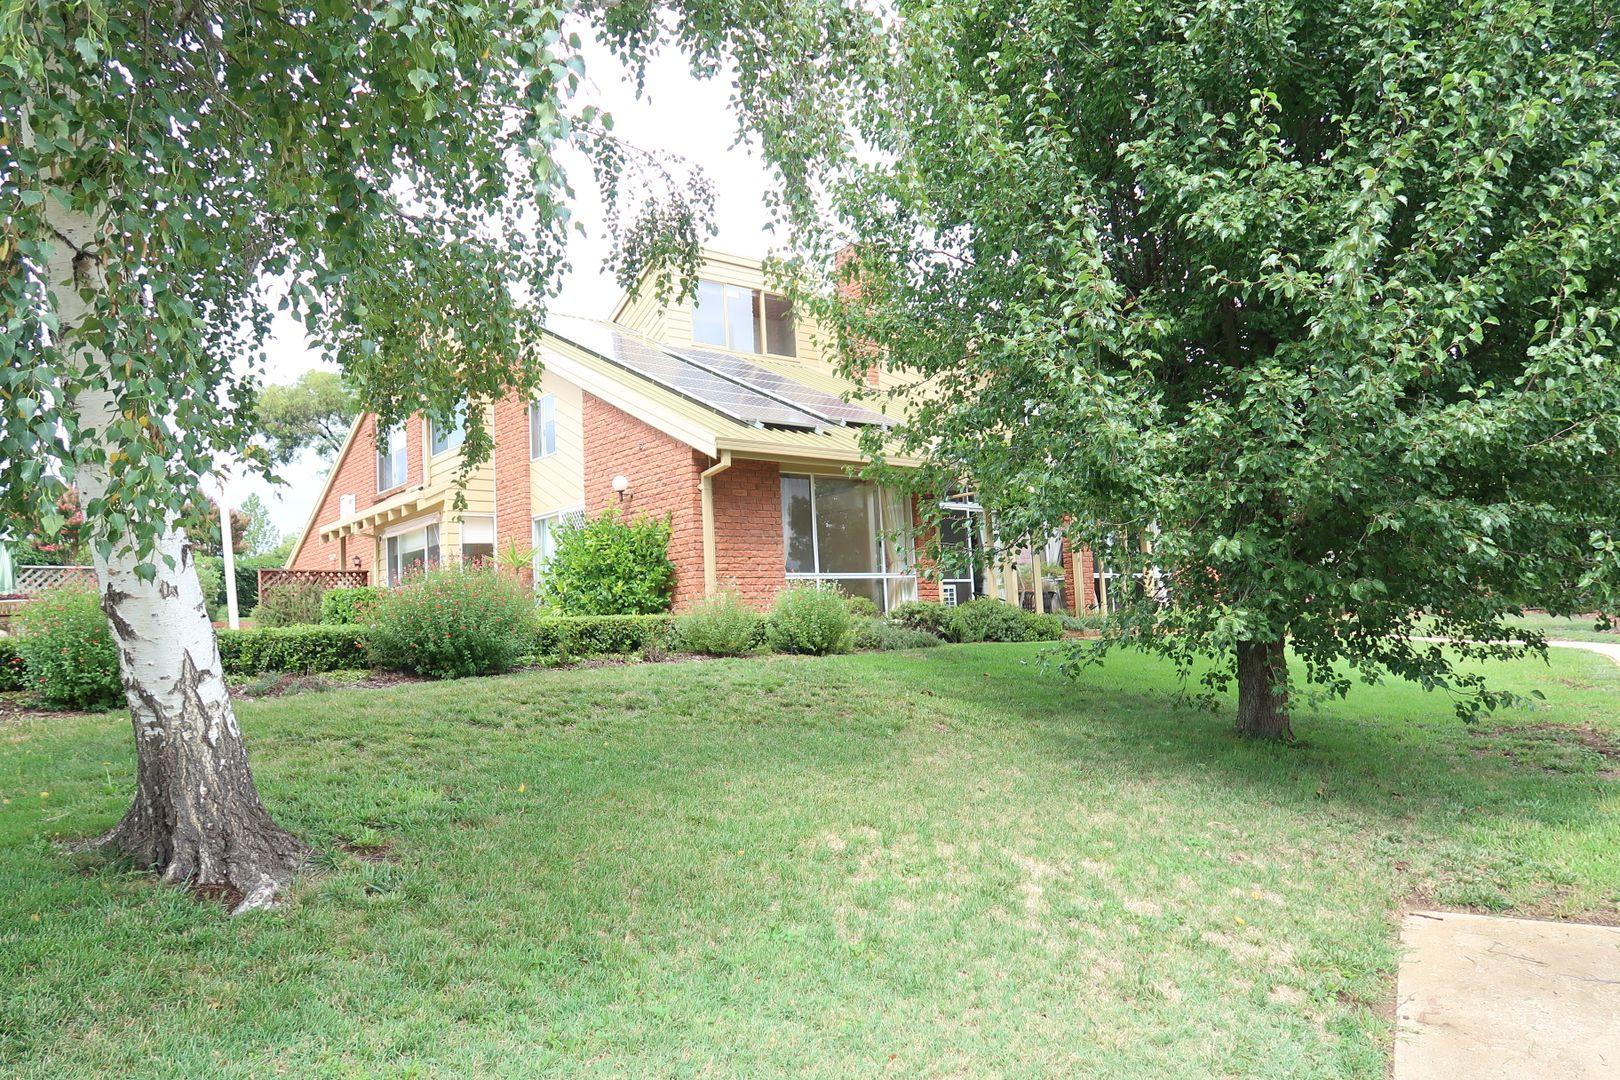 64 Tandora Street Kelso, Bathurst NSW 2795, Image 0